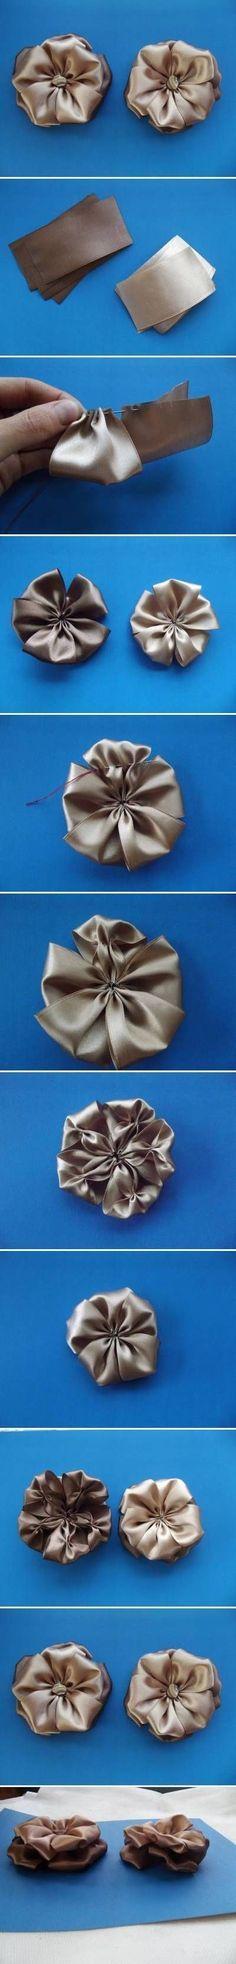 DIY Original Bow by kary